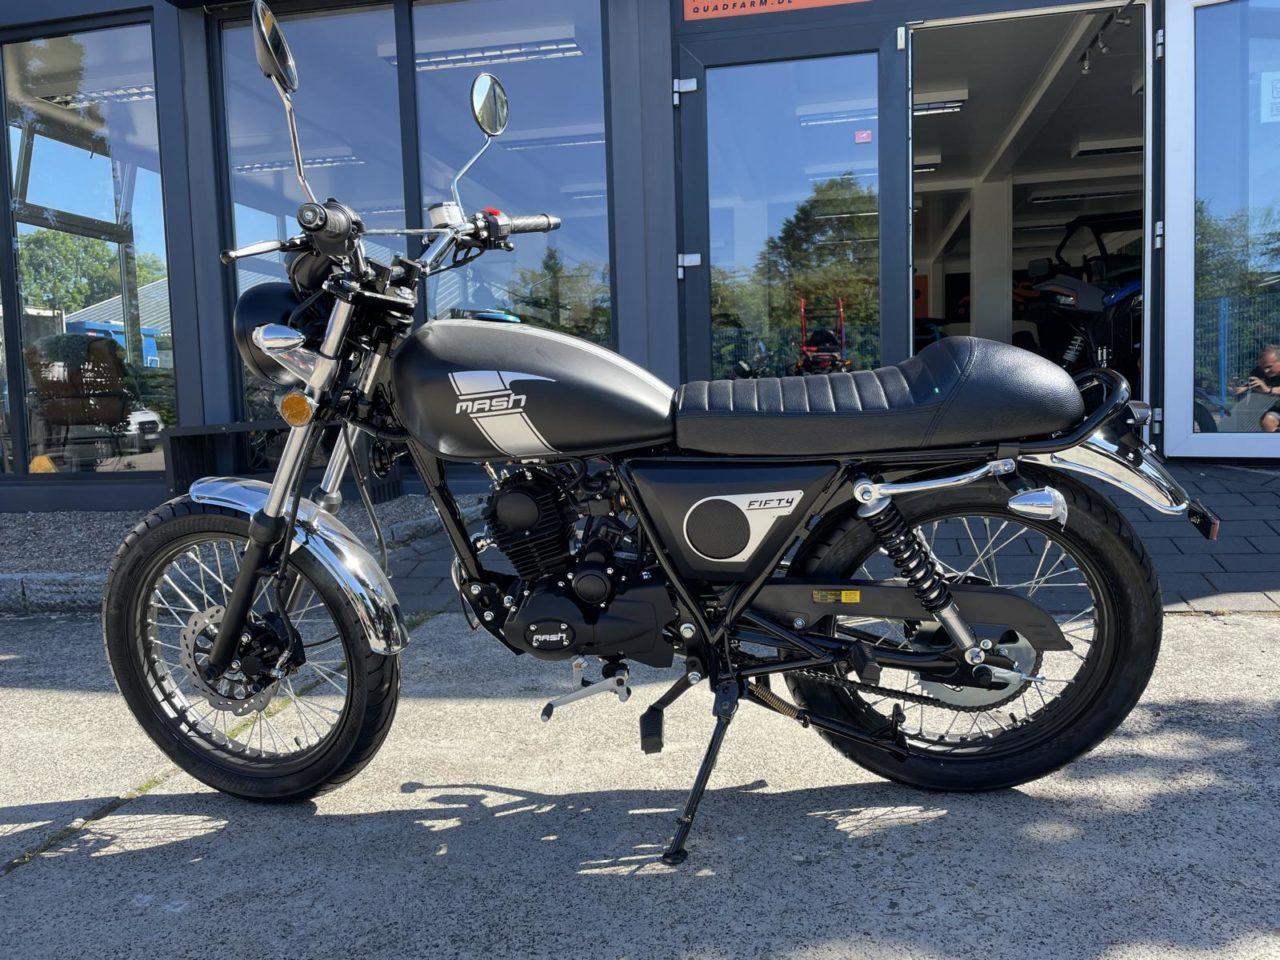 Motorrad, Moped, Mofa Mash 50 ccm Modell 50cc Fifty black